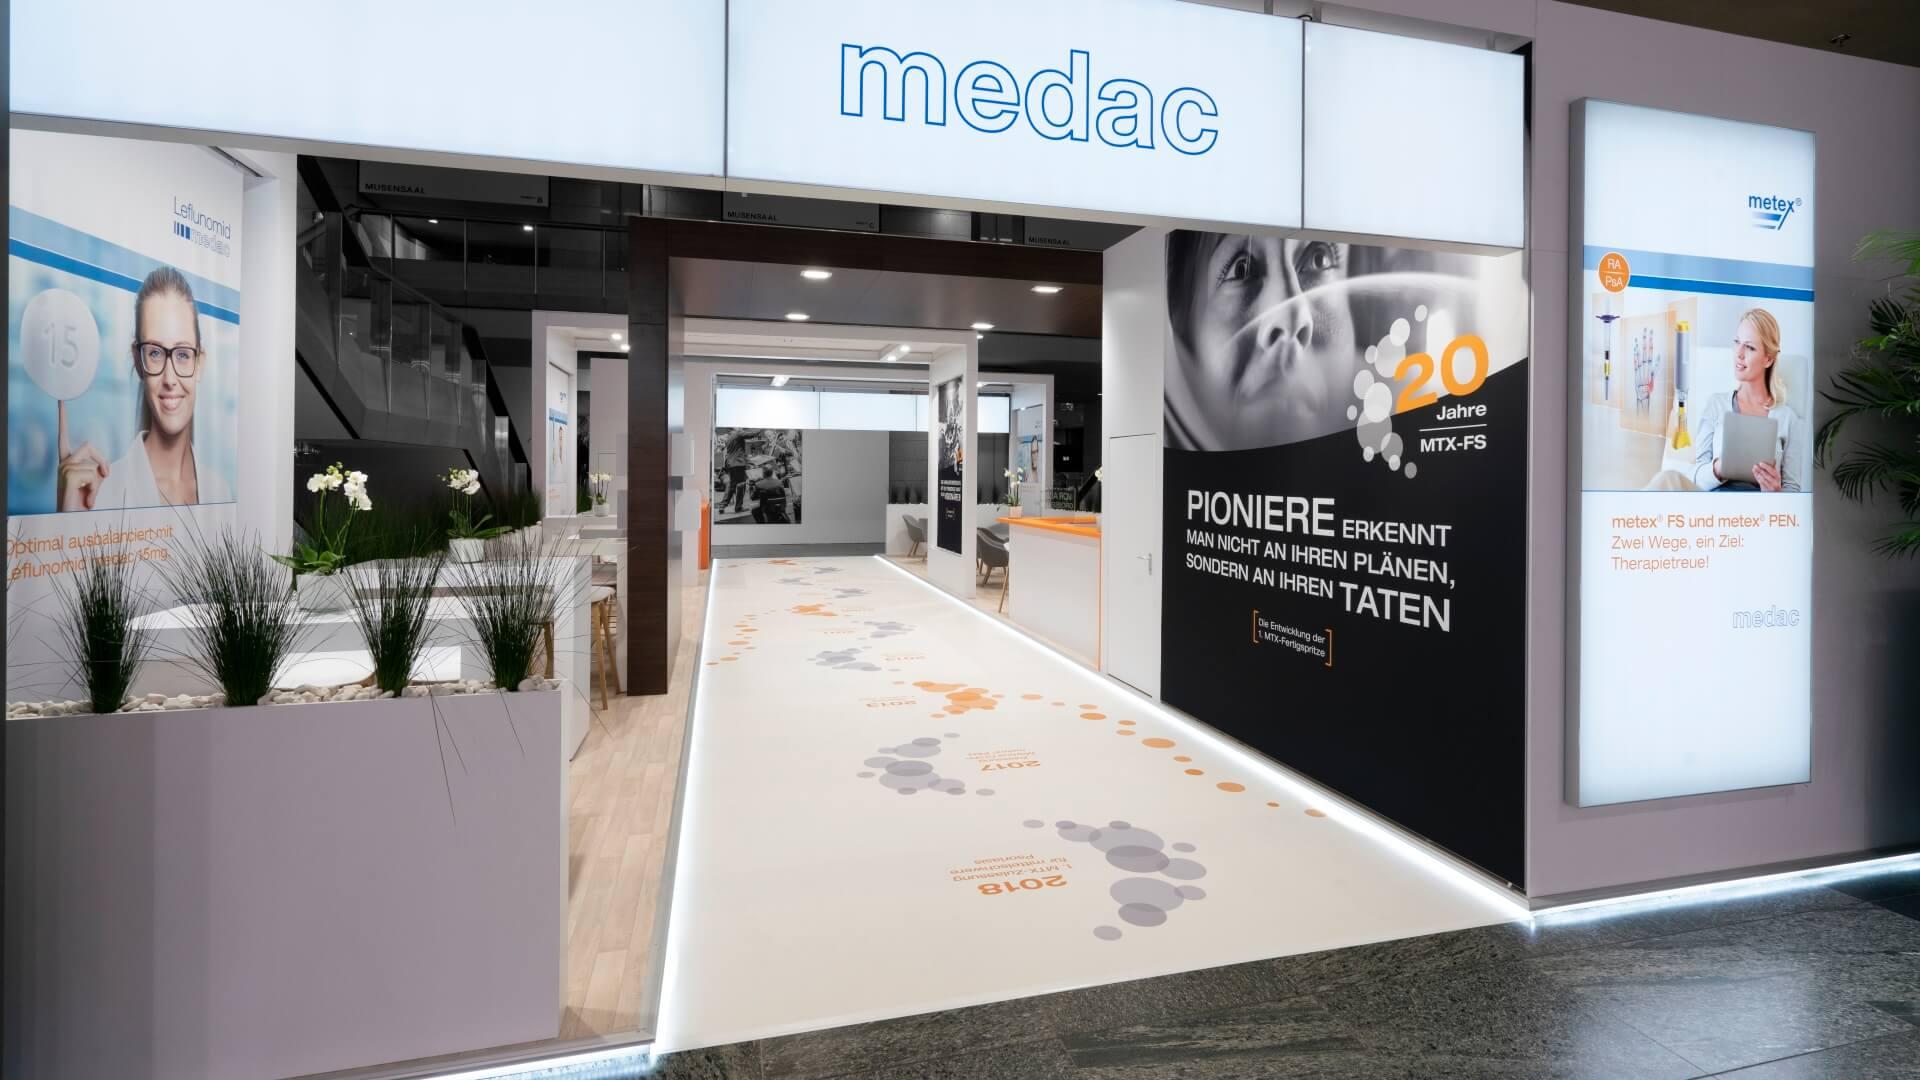 medac<br>130 m²<br>DGRh-Kongress